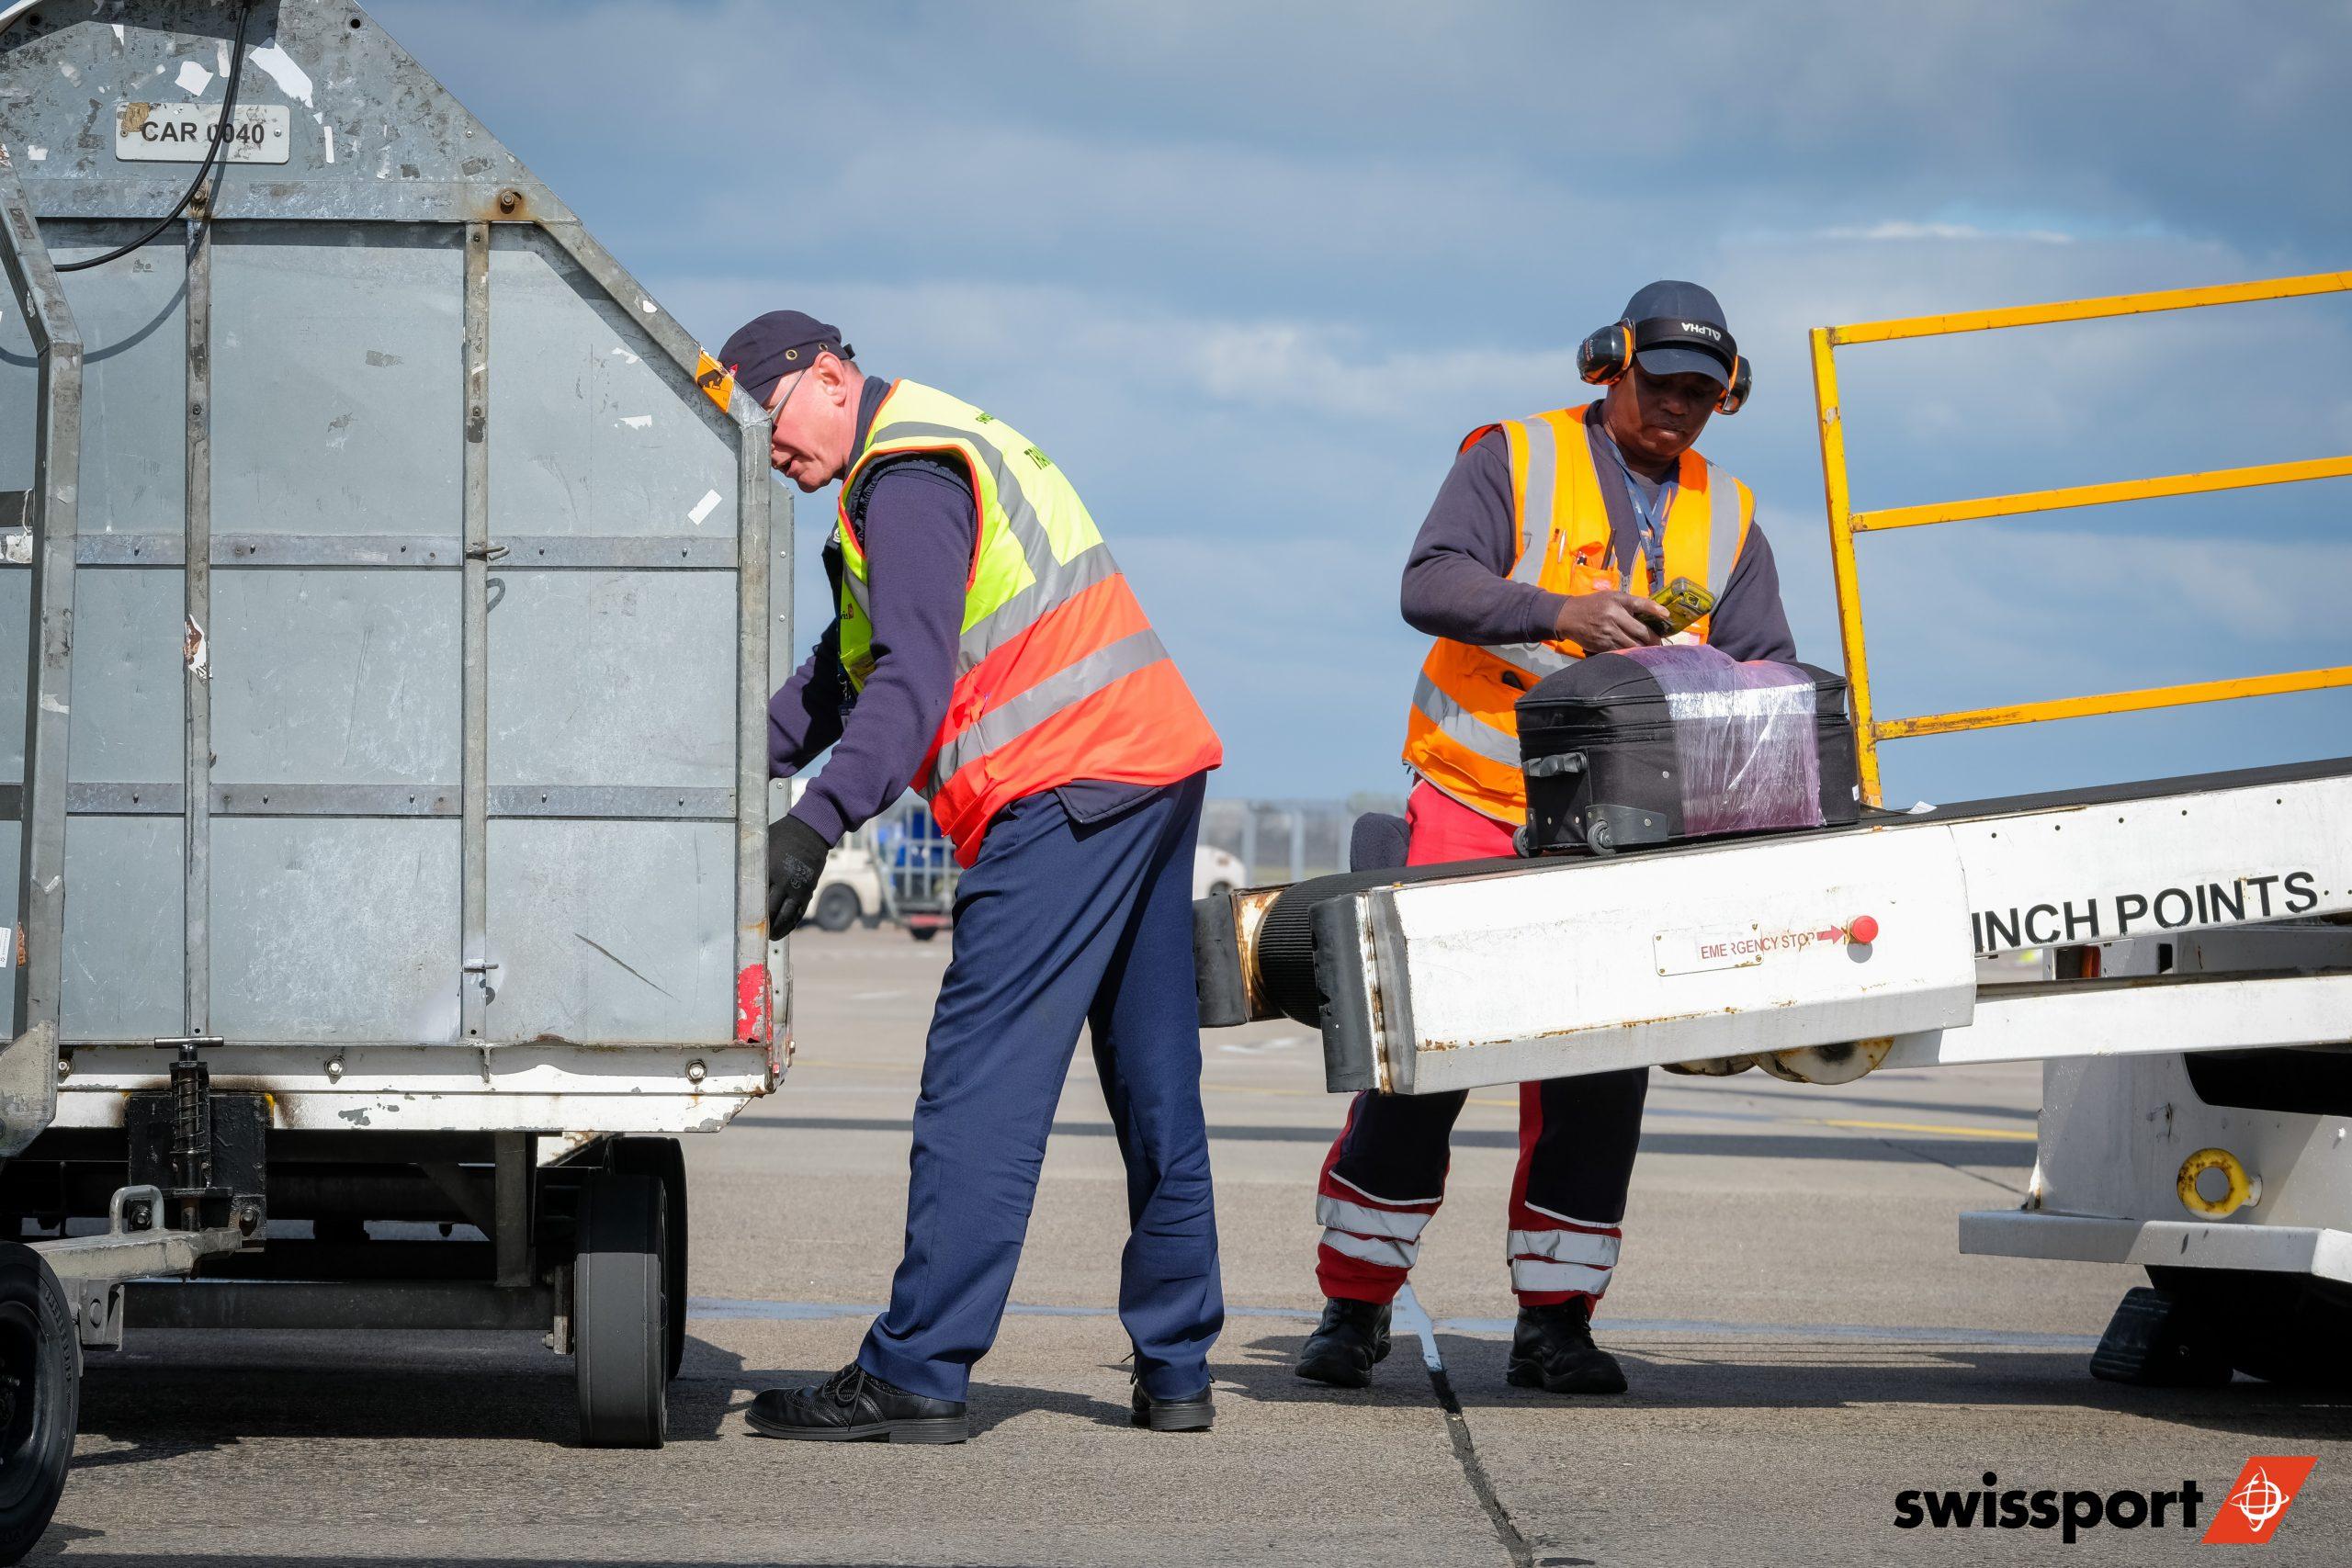 dublin-airport-photographer-loaders-swissport